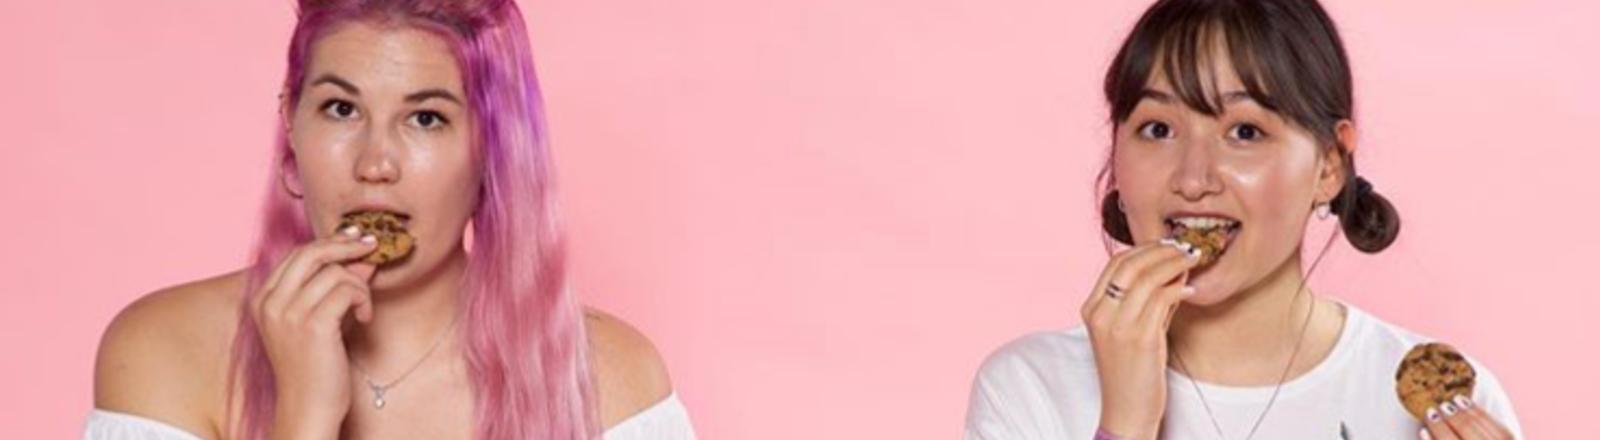 Lisa und Parnian vom Podcast K-Pop Pardon.